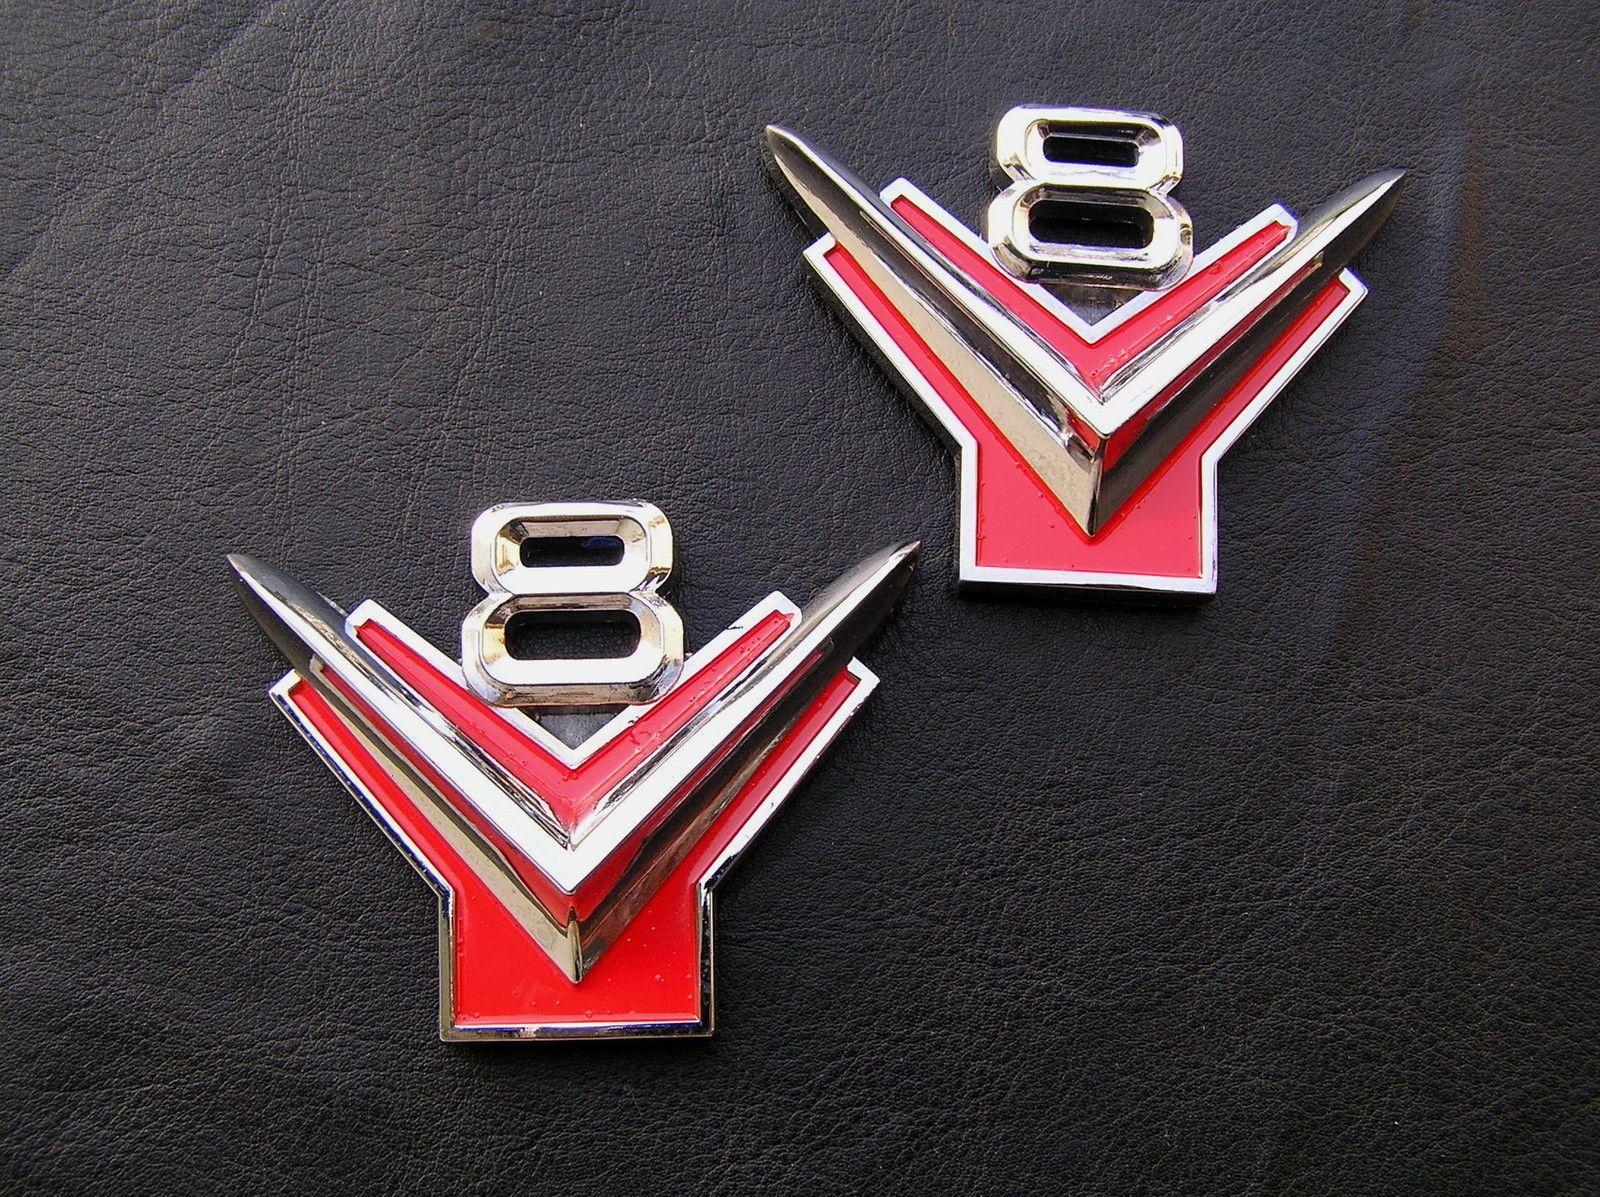 FORD V Y BLOCK PAIR Metal Car Emblems Badges NEW Suit - Car sign with namescustom car logodie casting abs car logos with names brand emblem